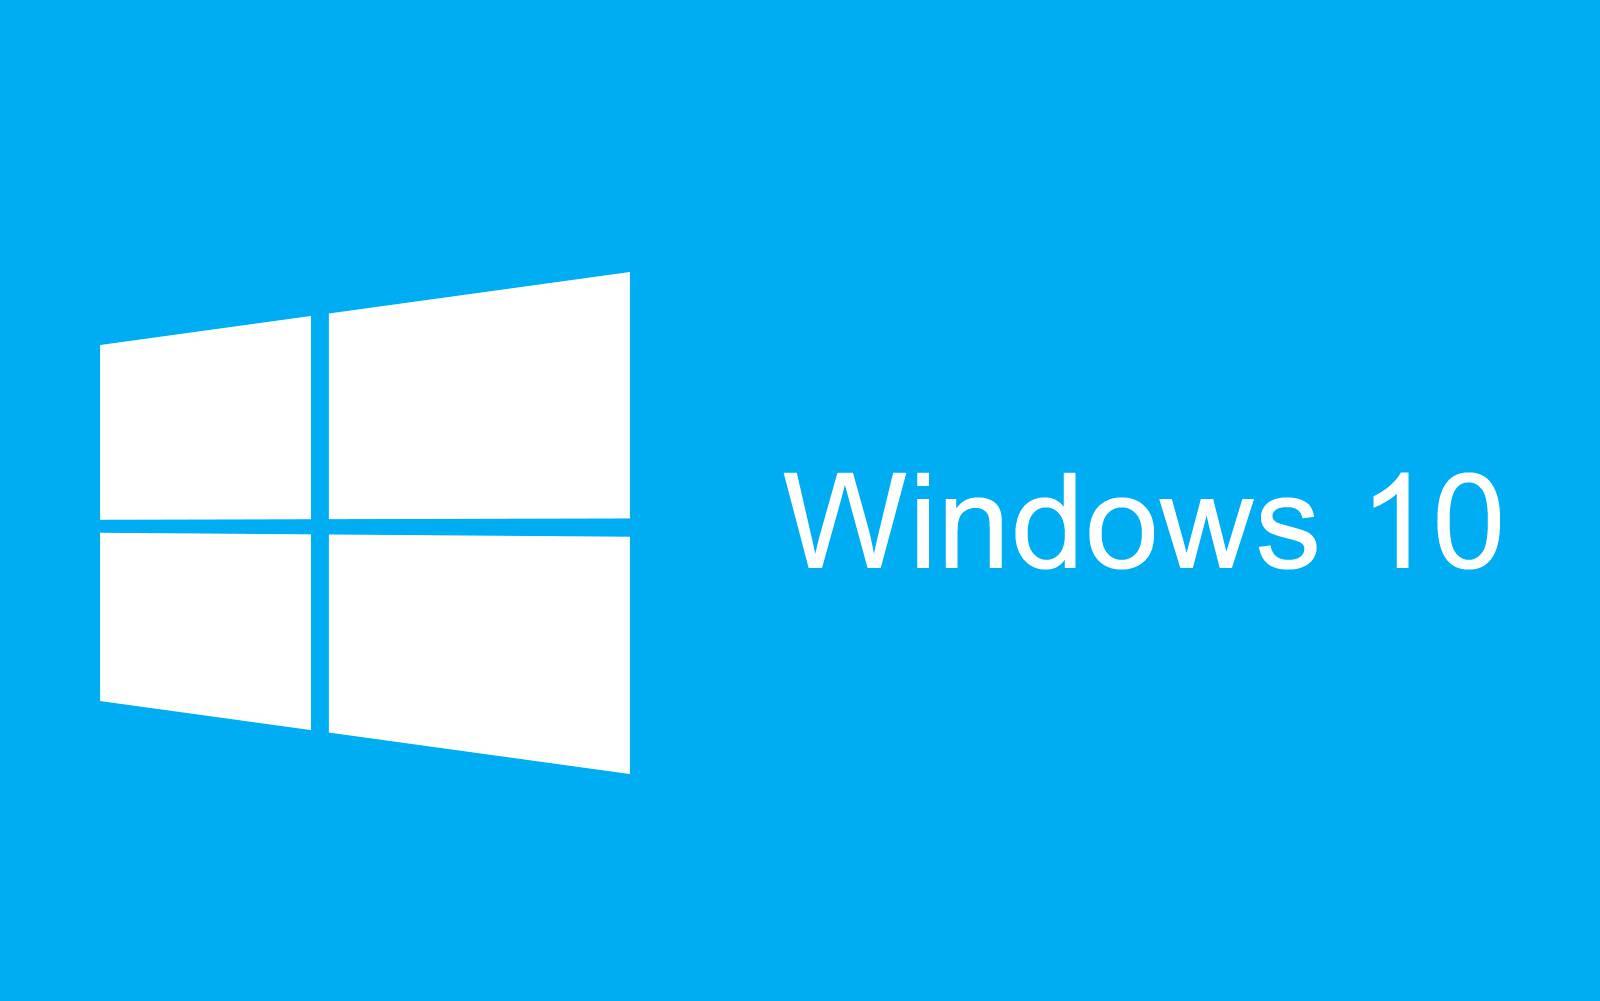 Windows 10 start menu imagine